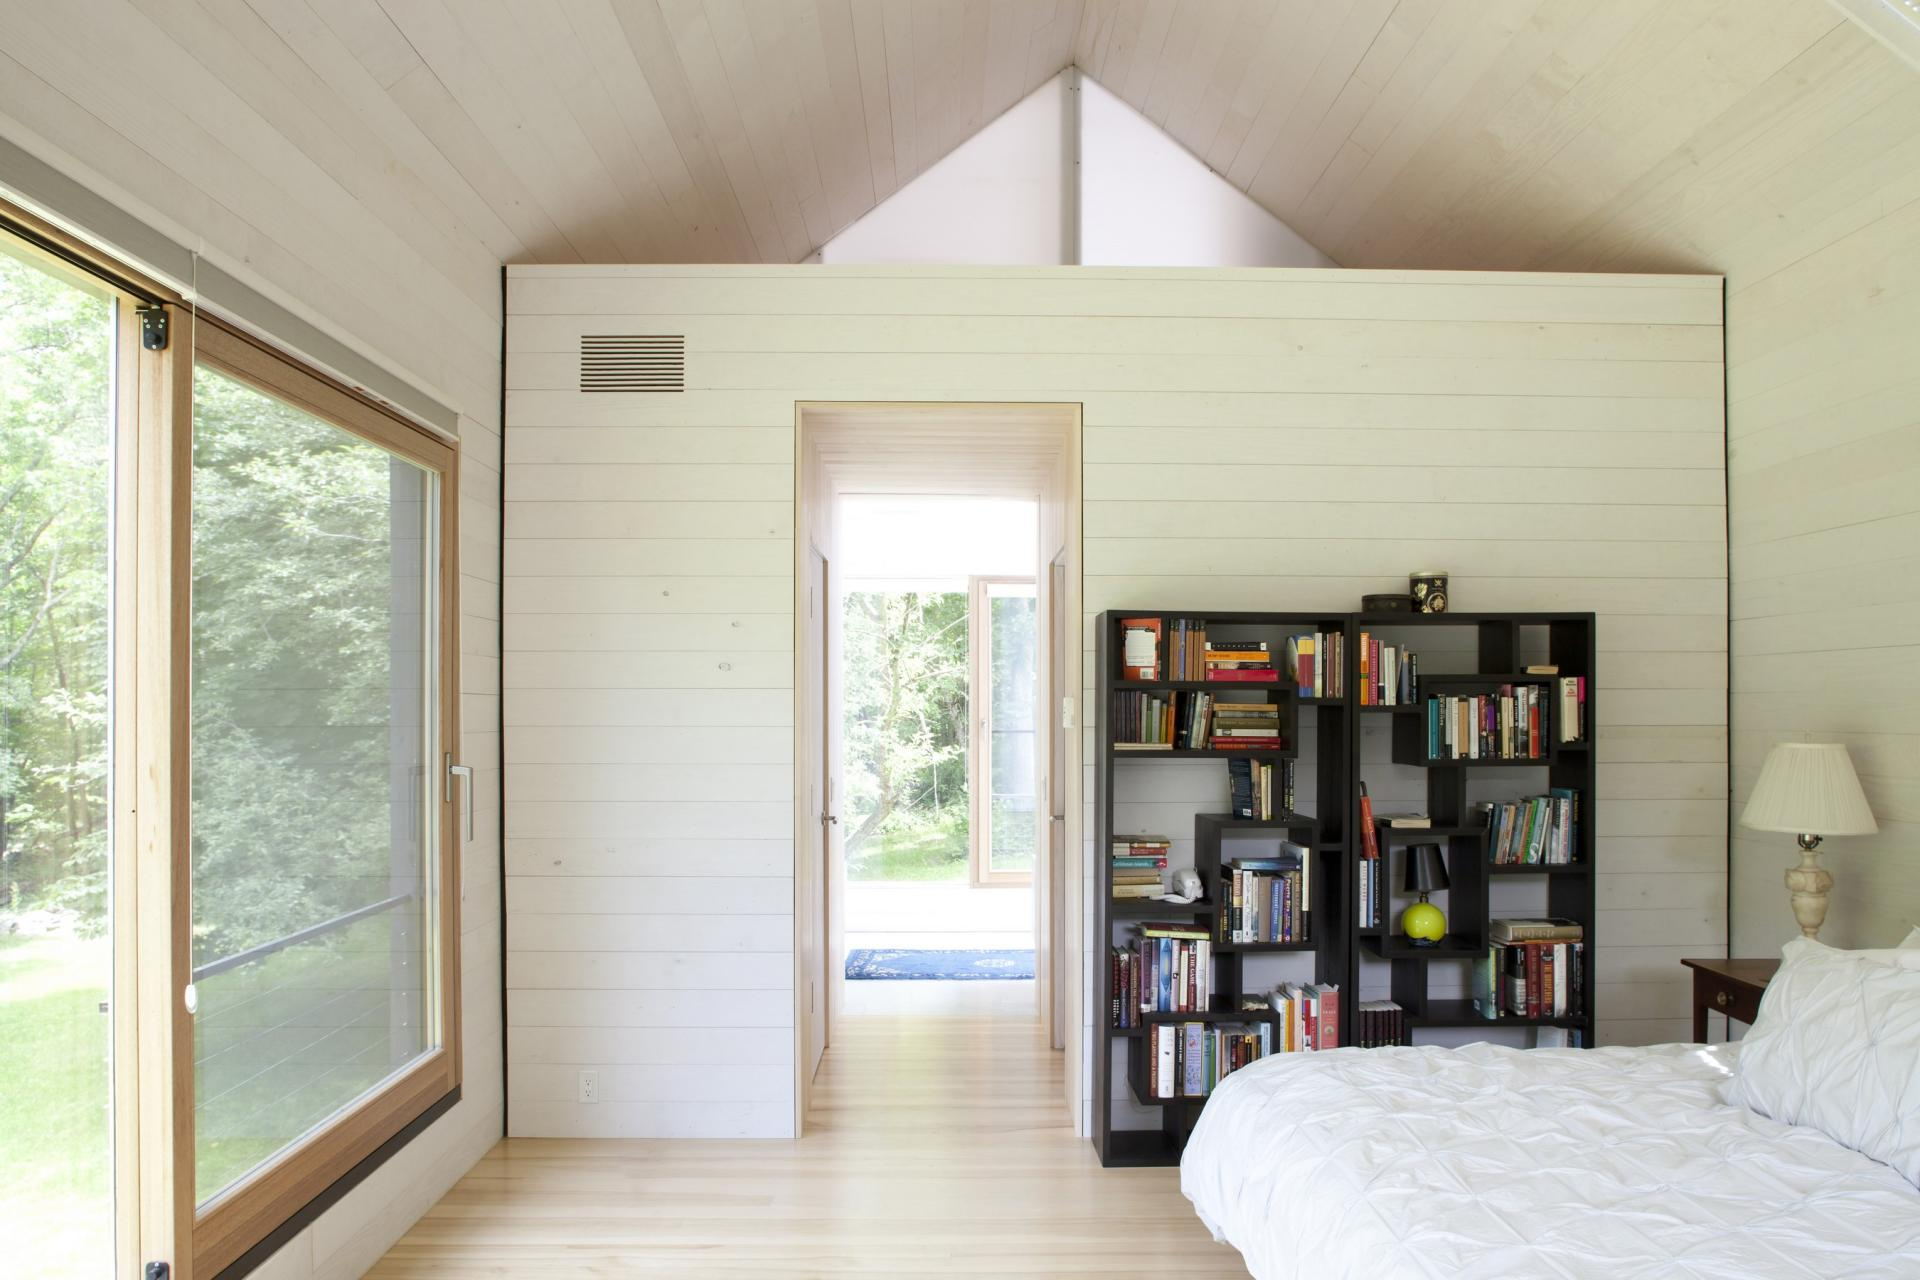 Bedroom, Rural Retreat in Bantam, Connecticut